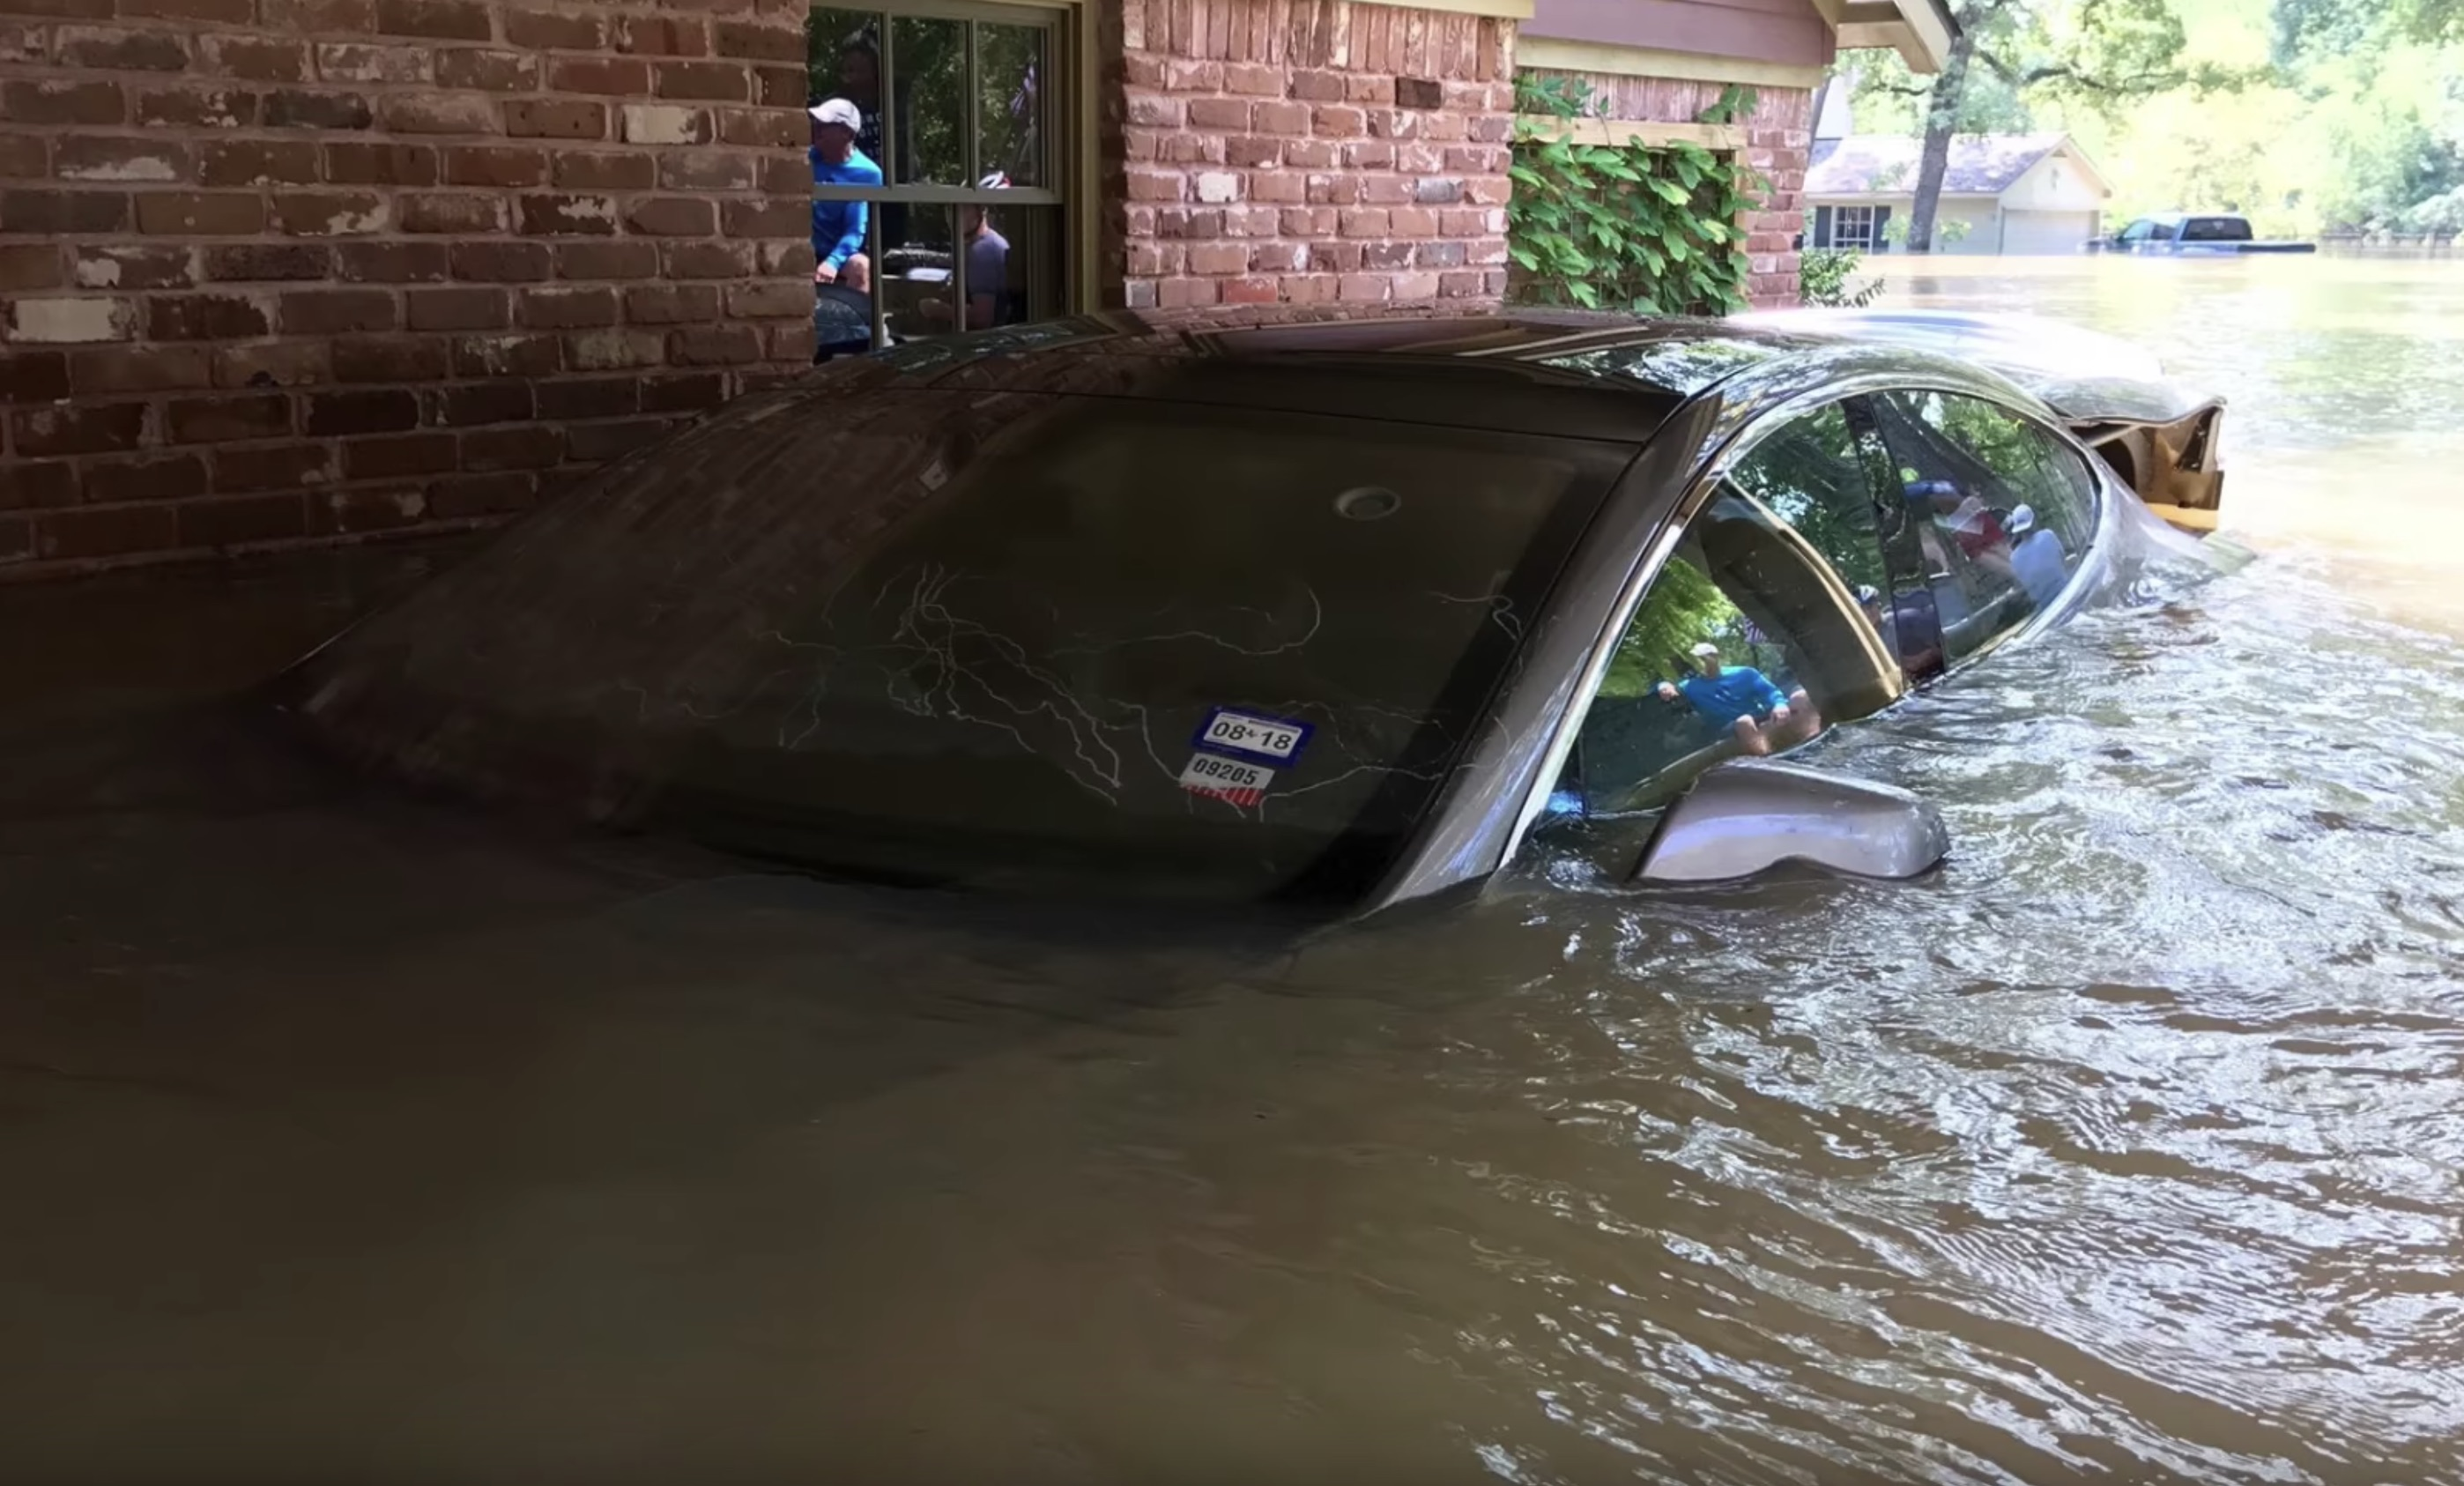 tesla-model-s-underwater-flood